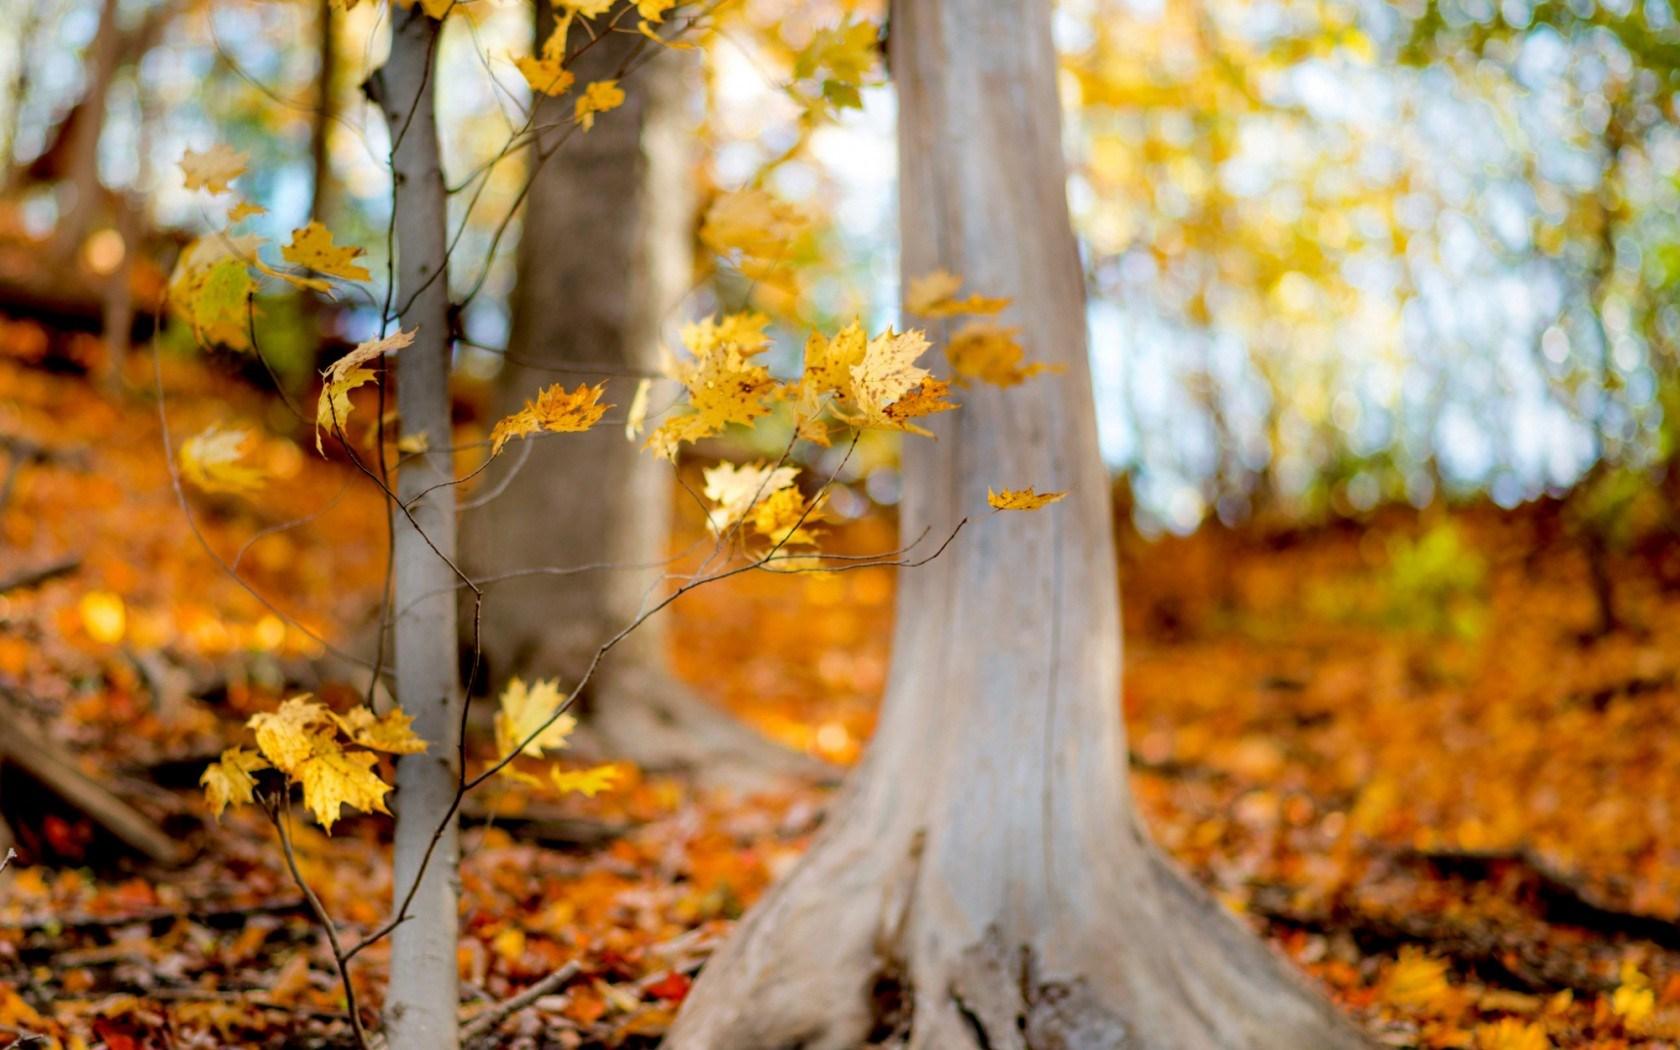 Name Live Wallpaper 3d Autumn Fall Trees Forest Hd Desktop Wallpapers 4k Hd